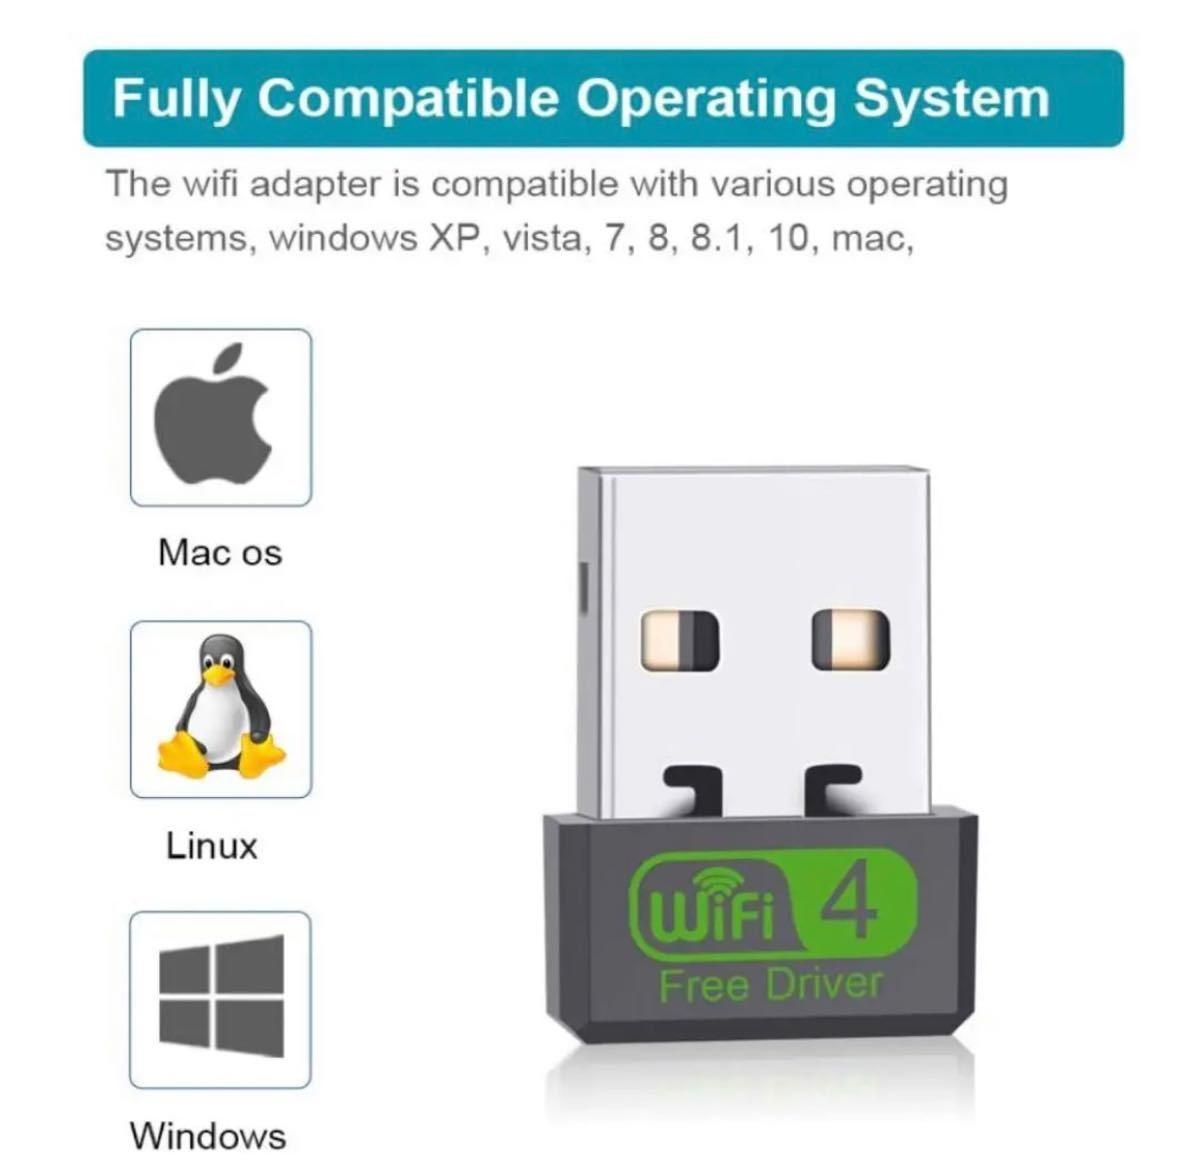 WiFi -1 無線LAN 子機 ラップトップデスクトップ用のUSBWiFi